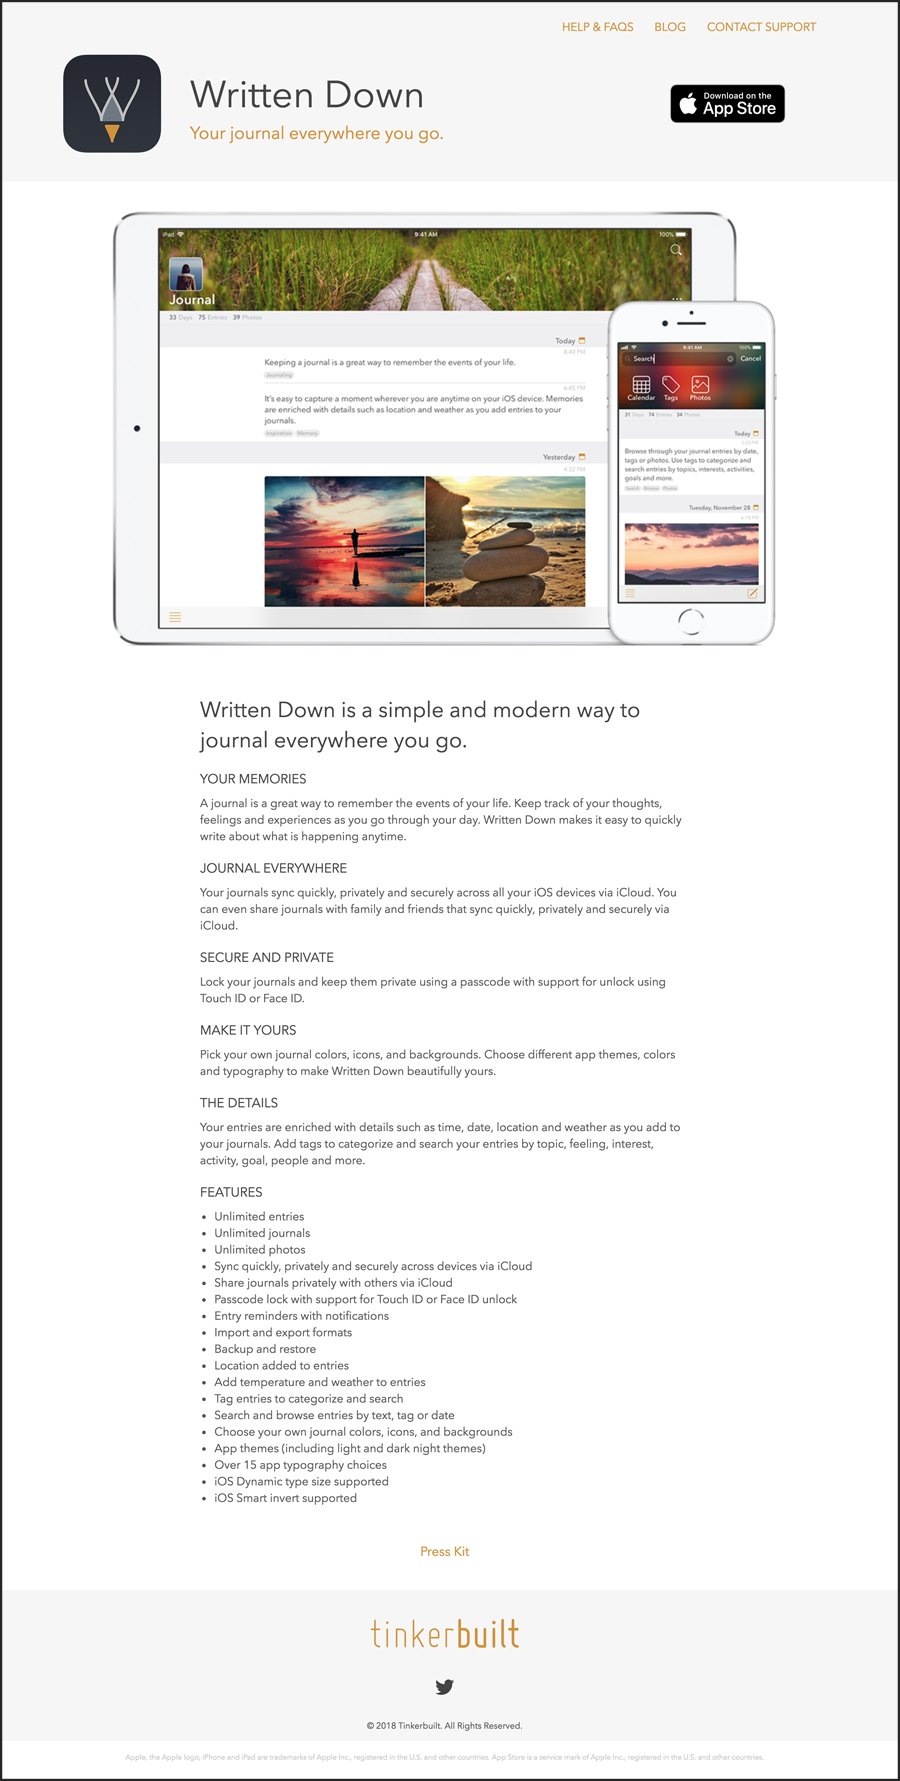 TinkerbuiltWebsite